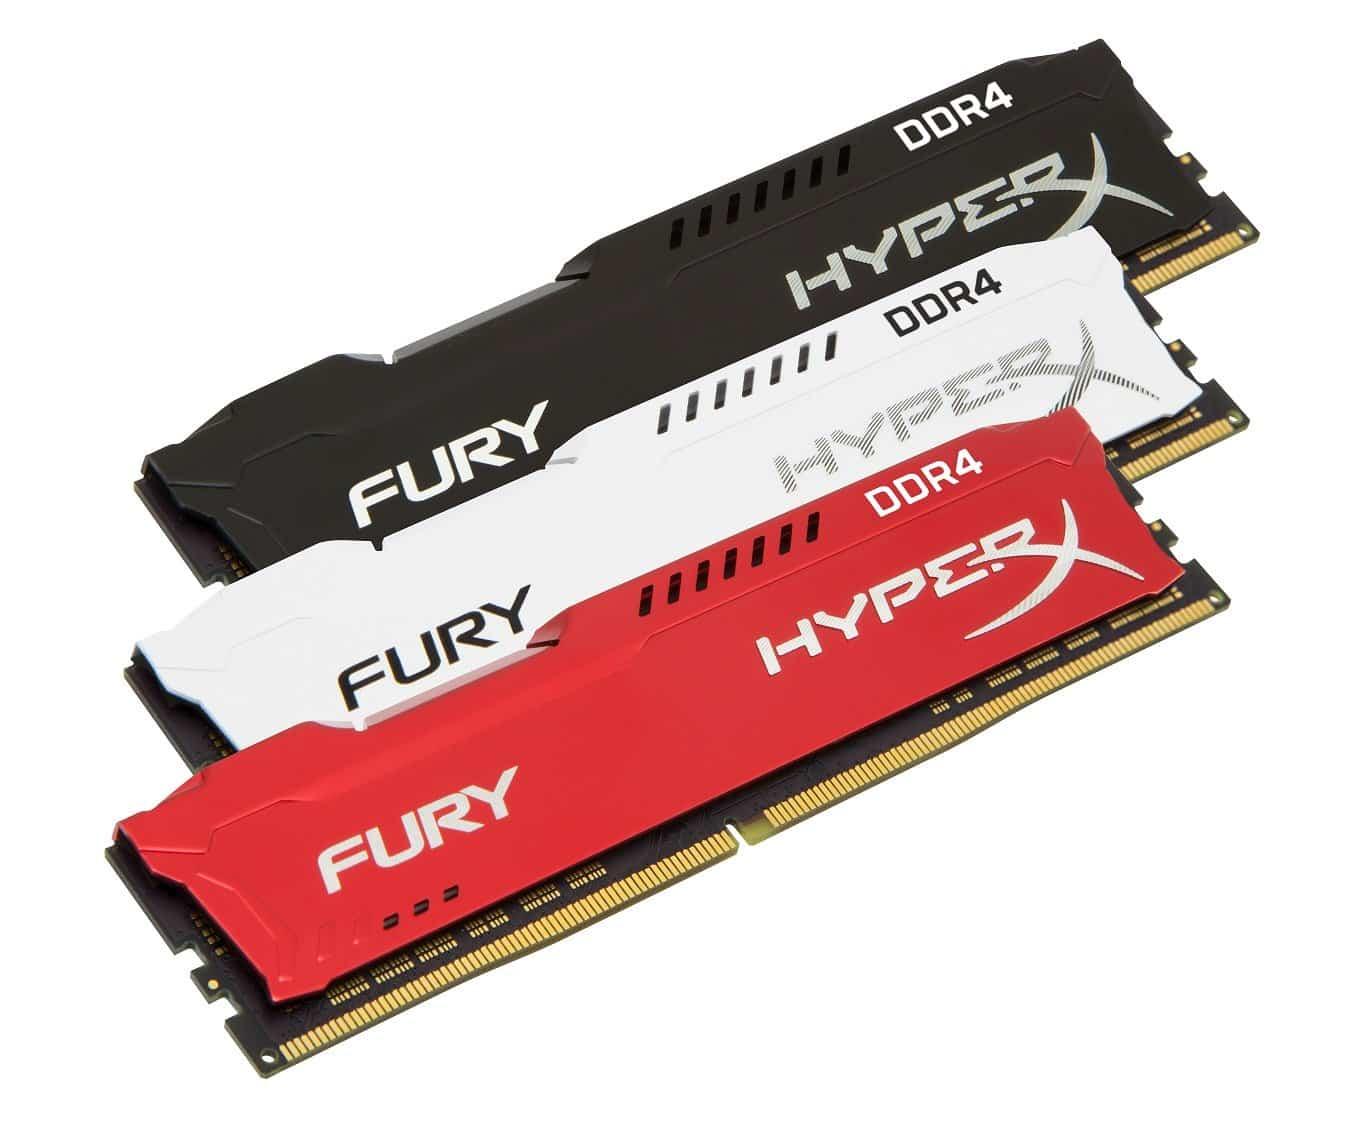 HyperX FURY DDR4 Family 1 - HyperX обновила линейку модулей ОЗУ FURY DDR4 с автоматическим разгоном